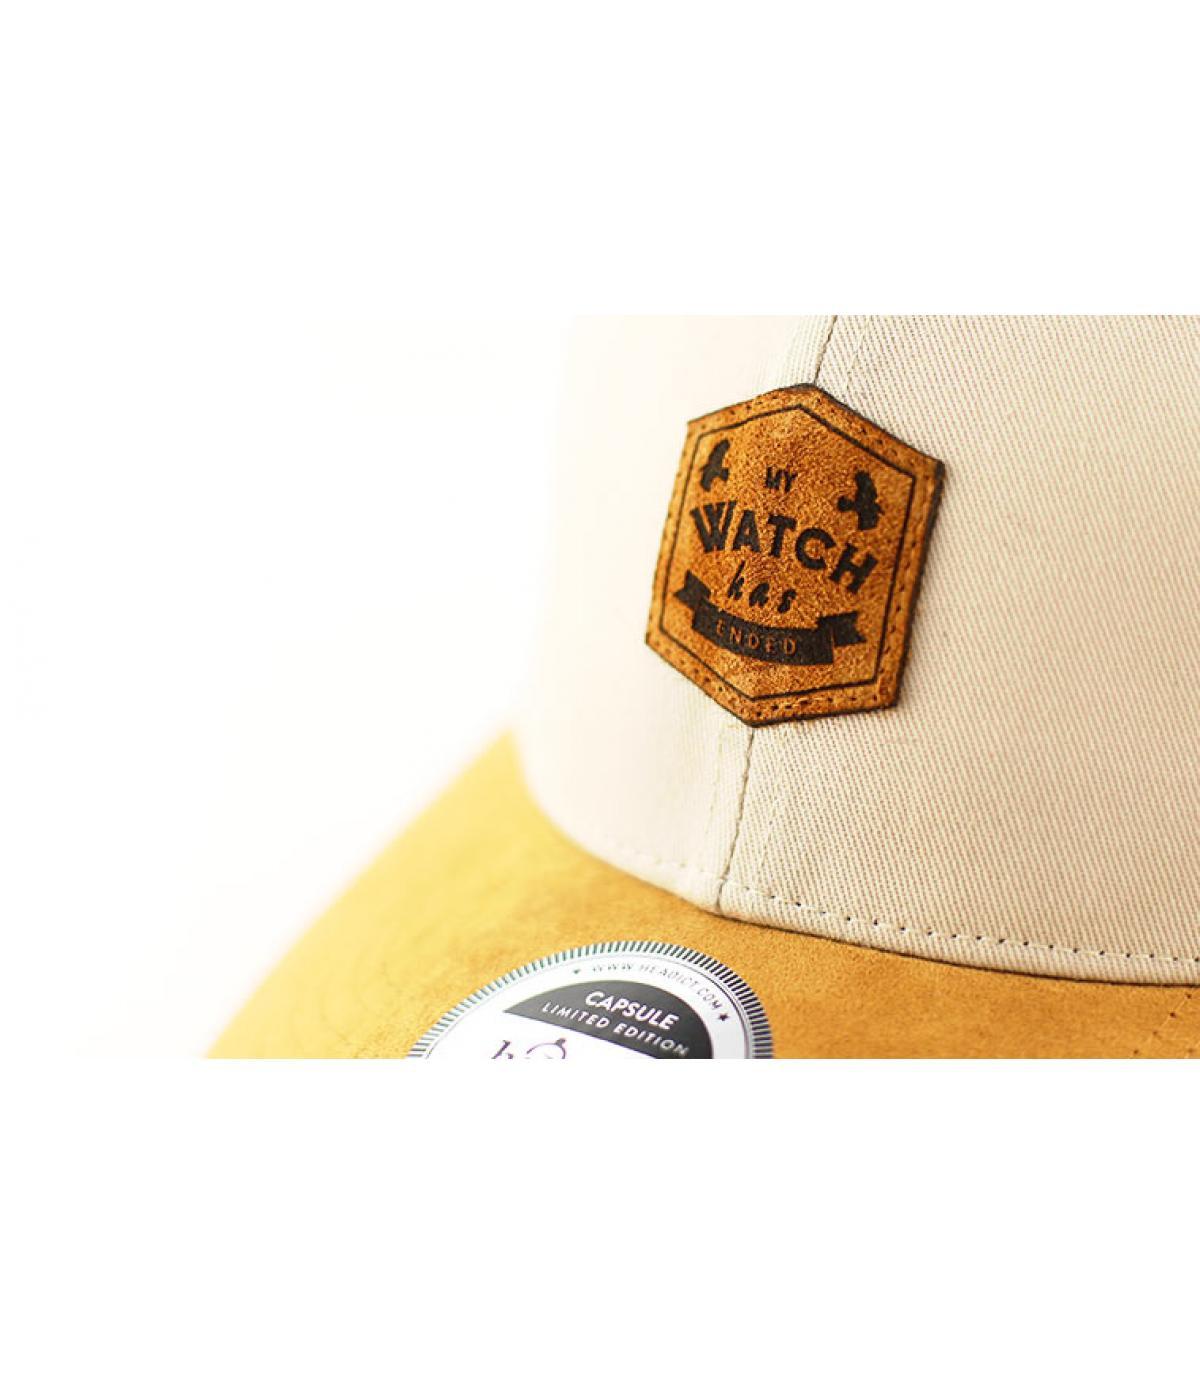 Details Curve My Watch Ends Now beige brown - afbeeling 3